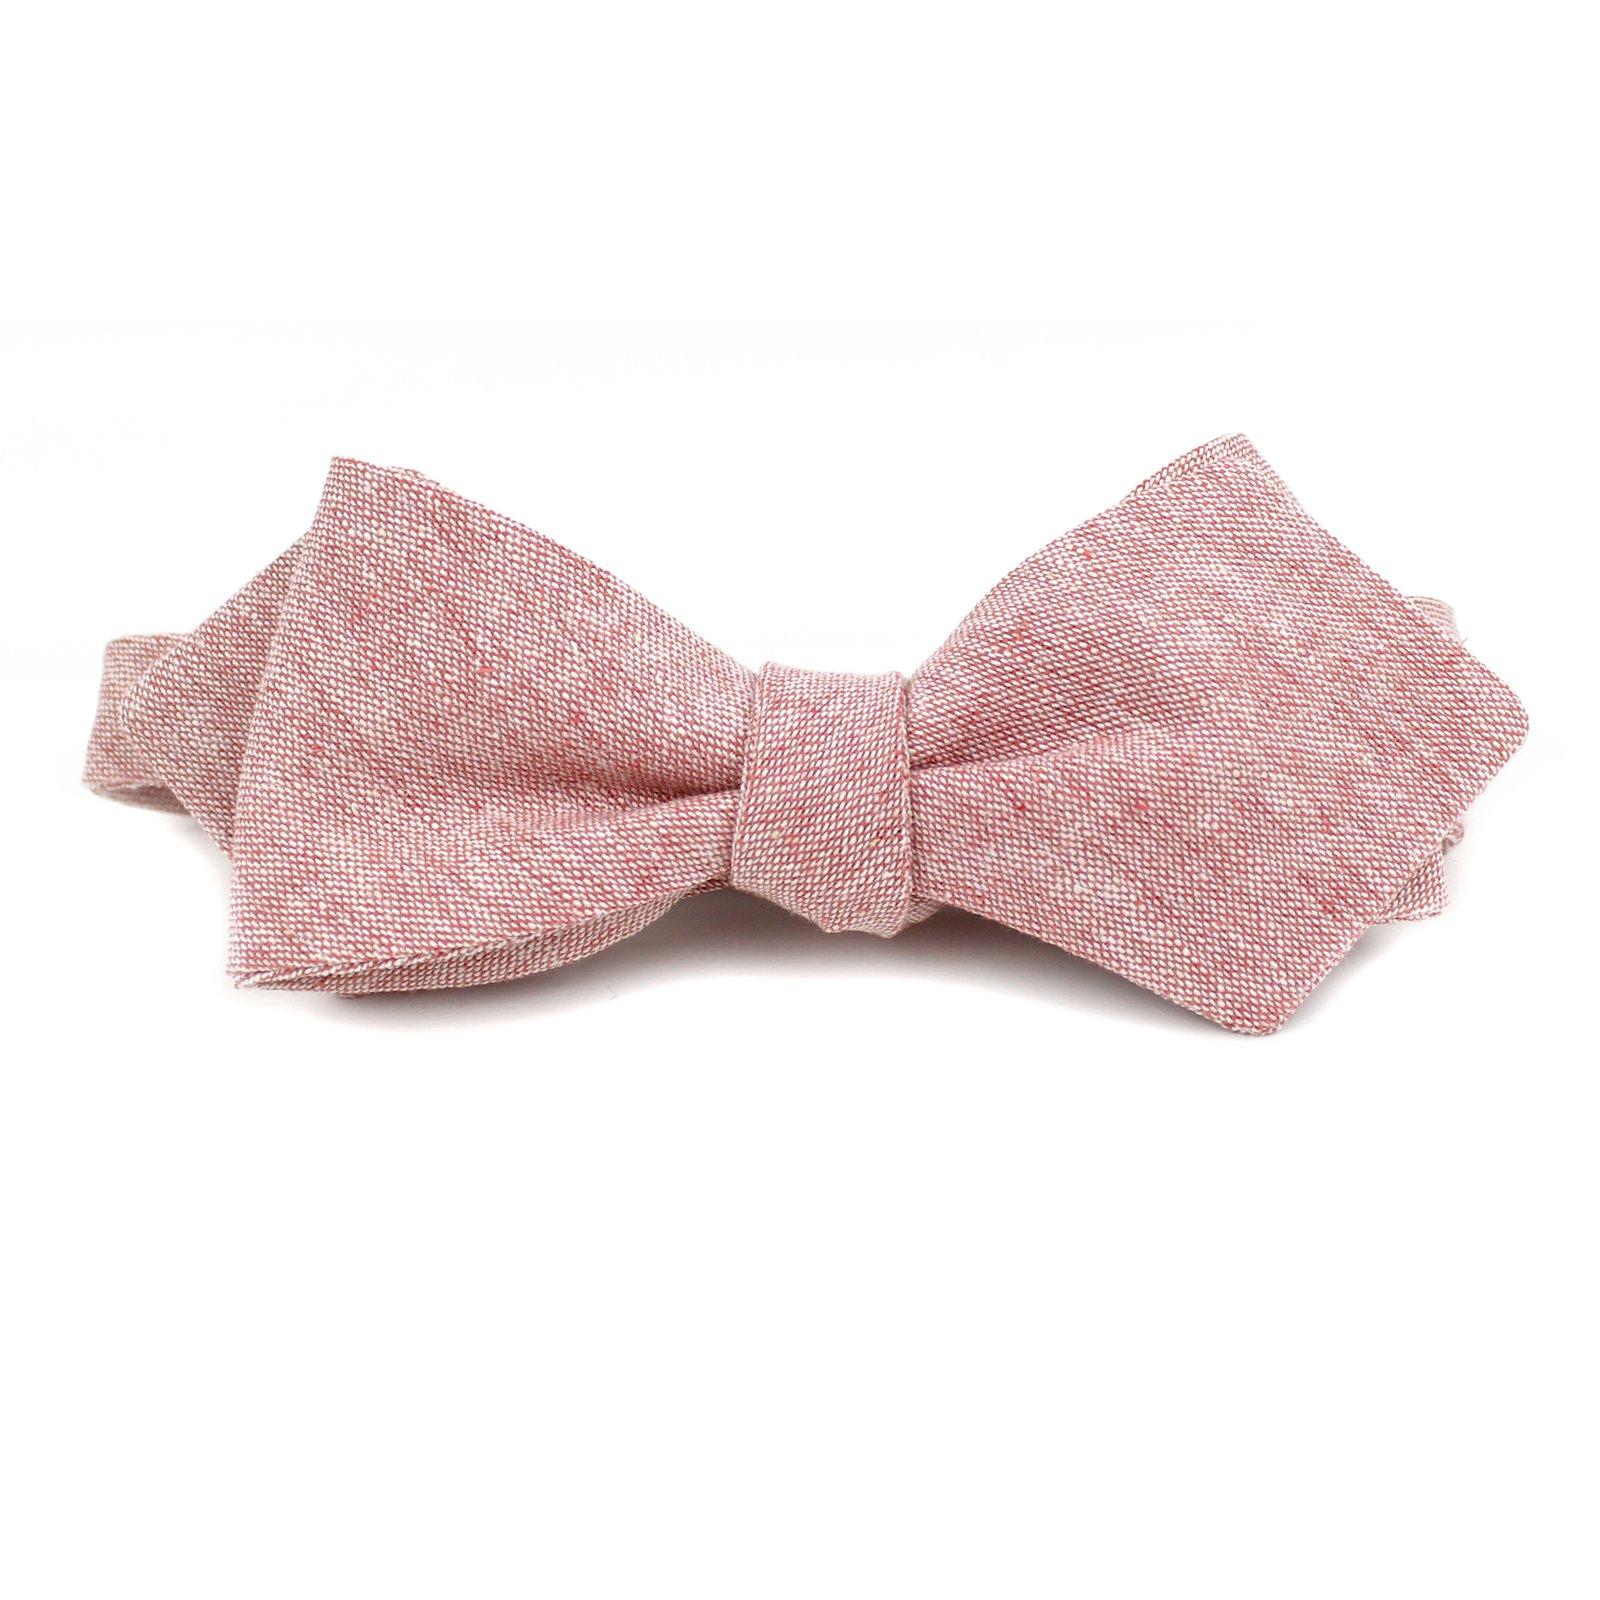 Vintage Bow Tie Pink Linen